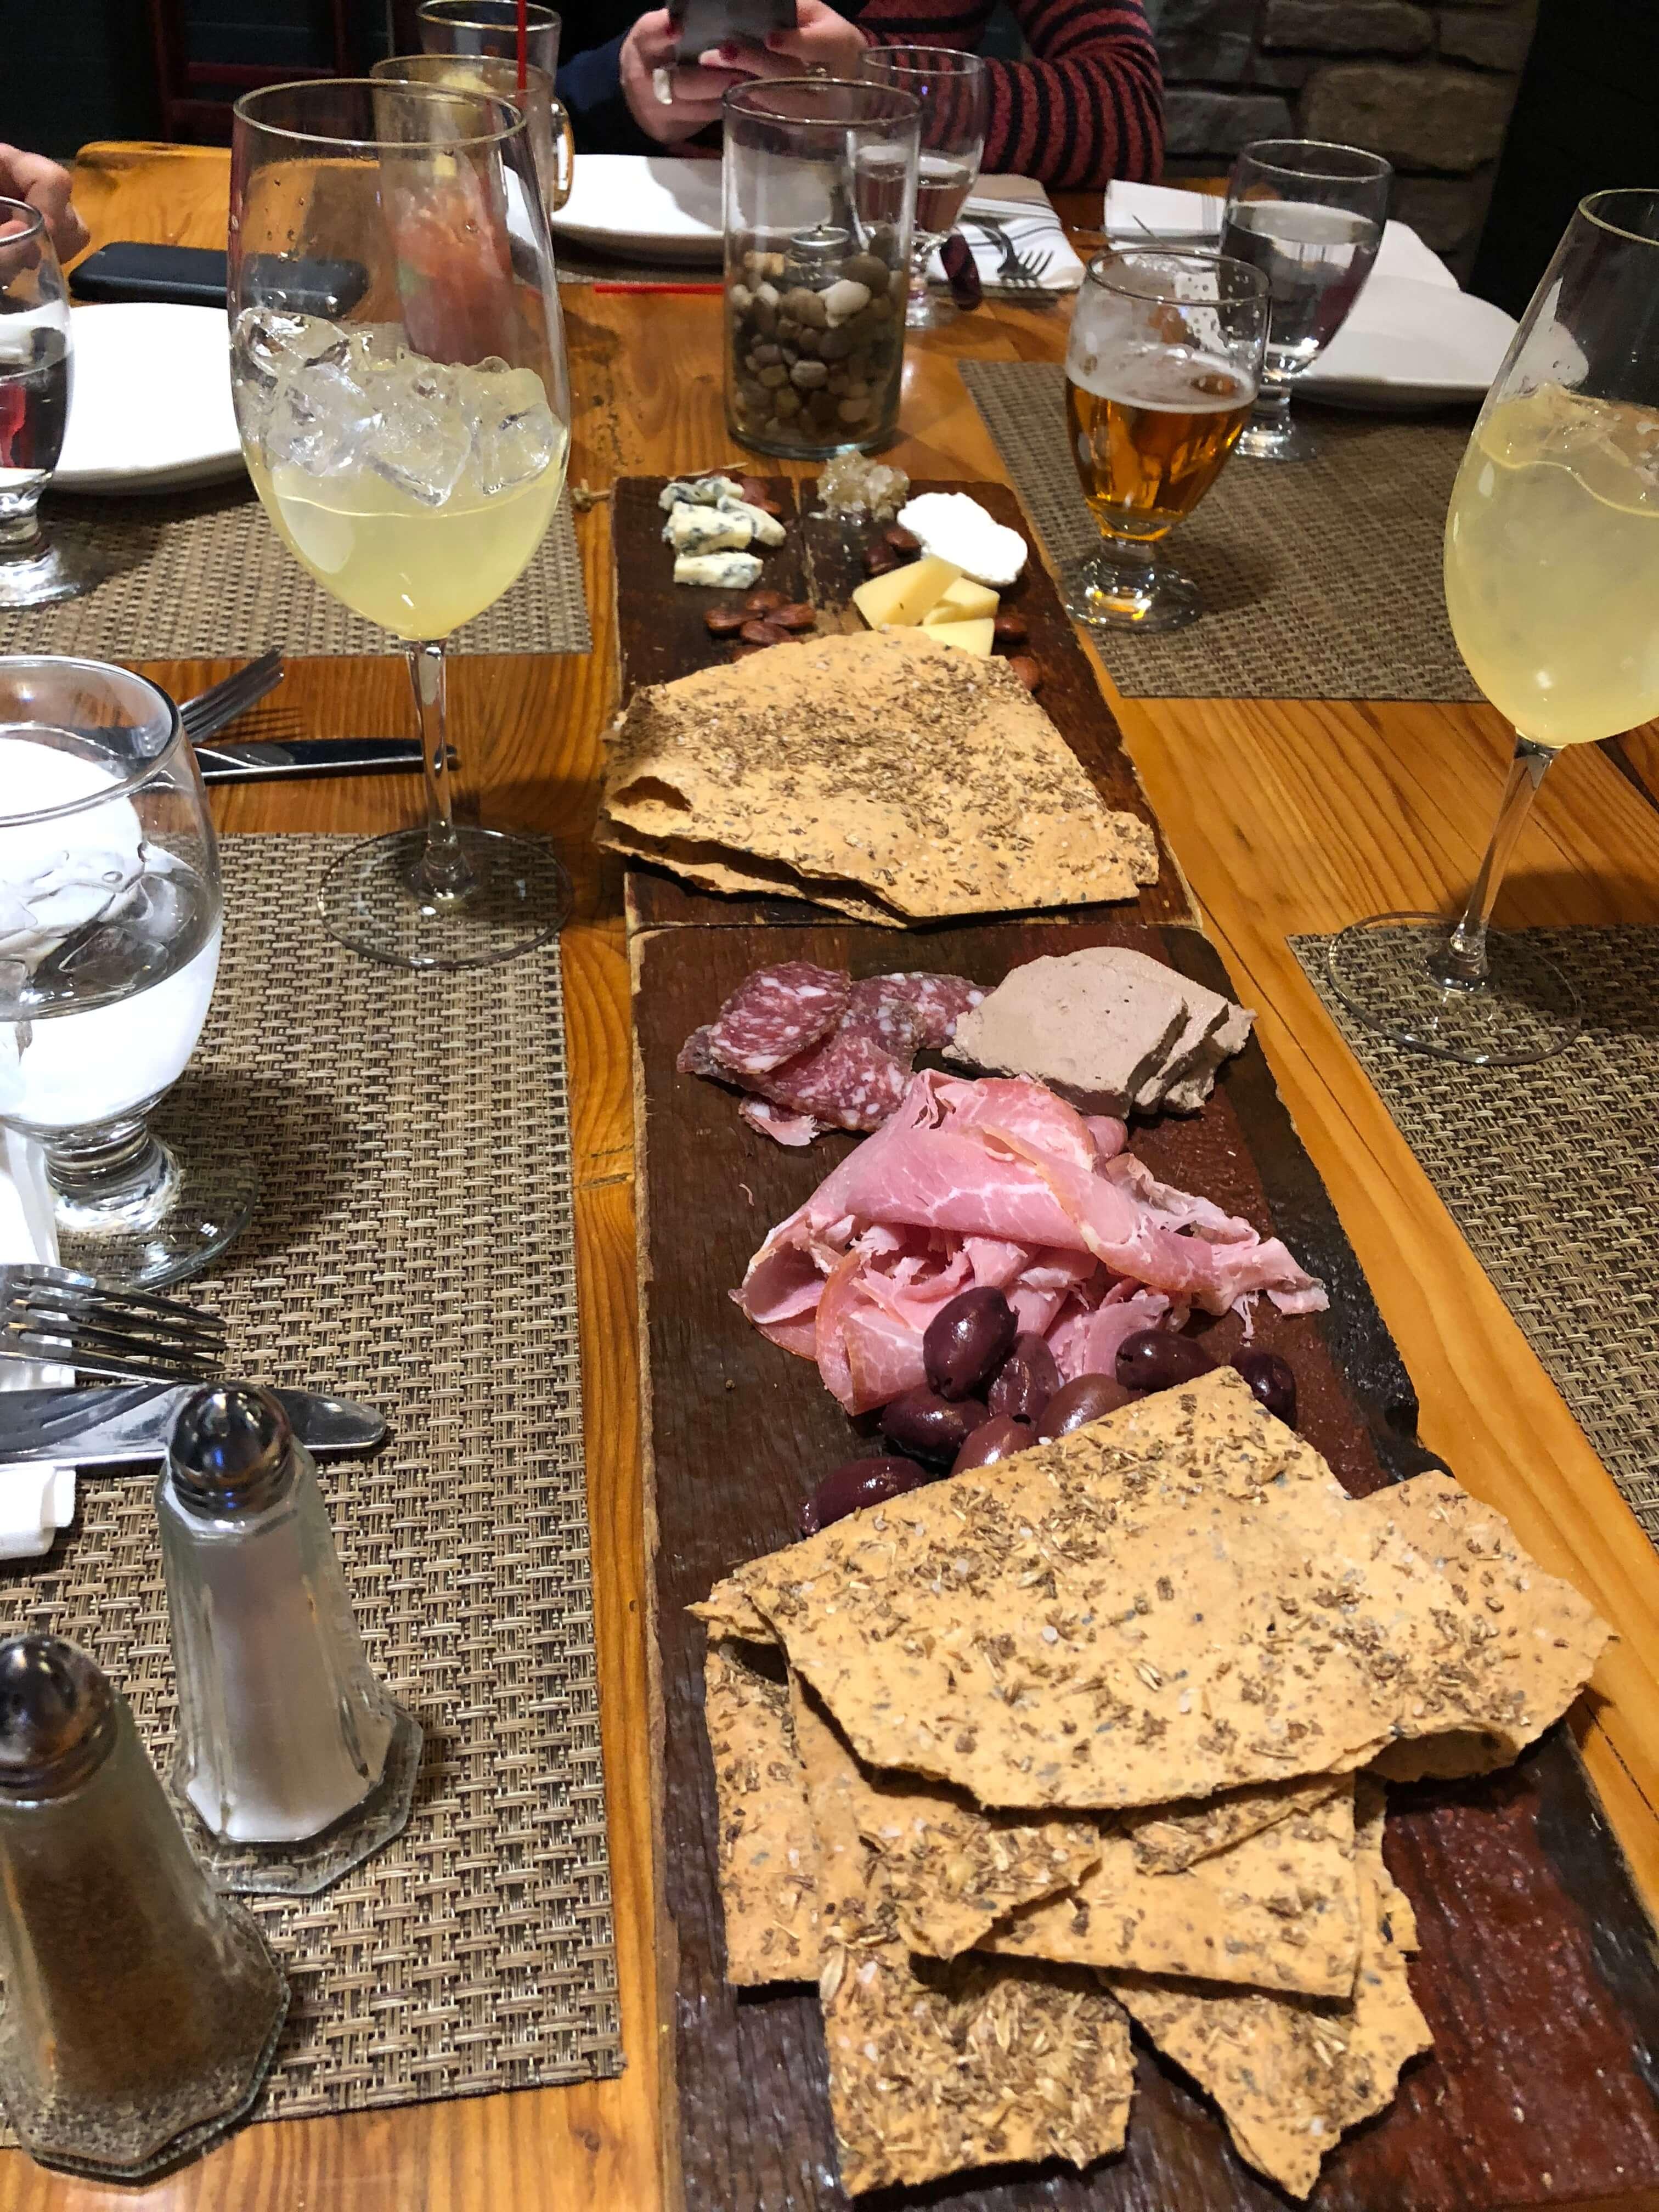 Killington Resort learn to ski program meat platter